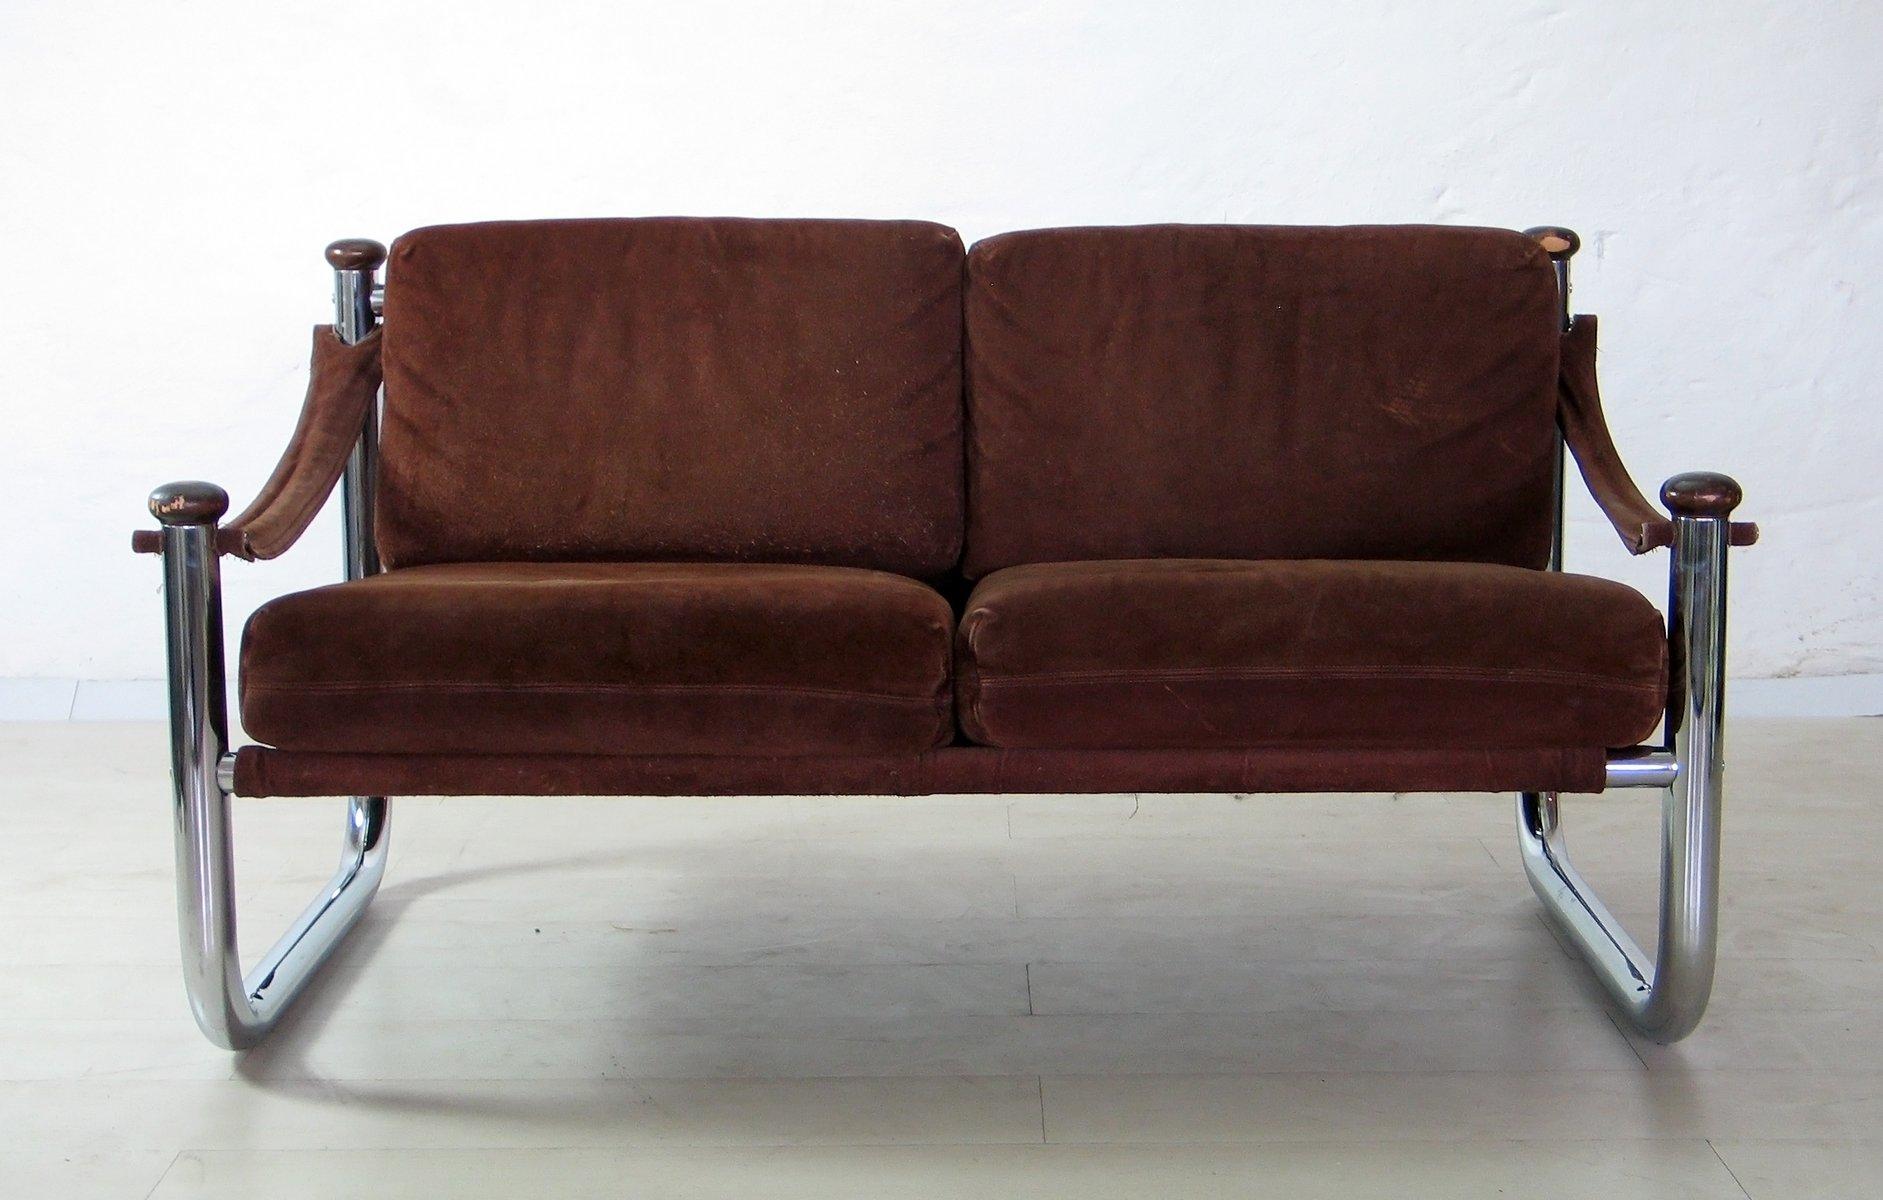 kanadische vintage nubuk leder sofas von qu bec 69 2er set bei pamono kaufen. Black Bedroom Furniture Sets. Home Design Ideas